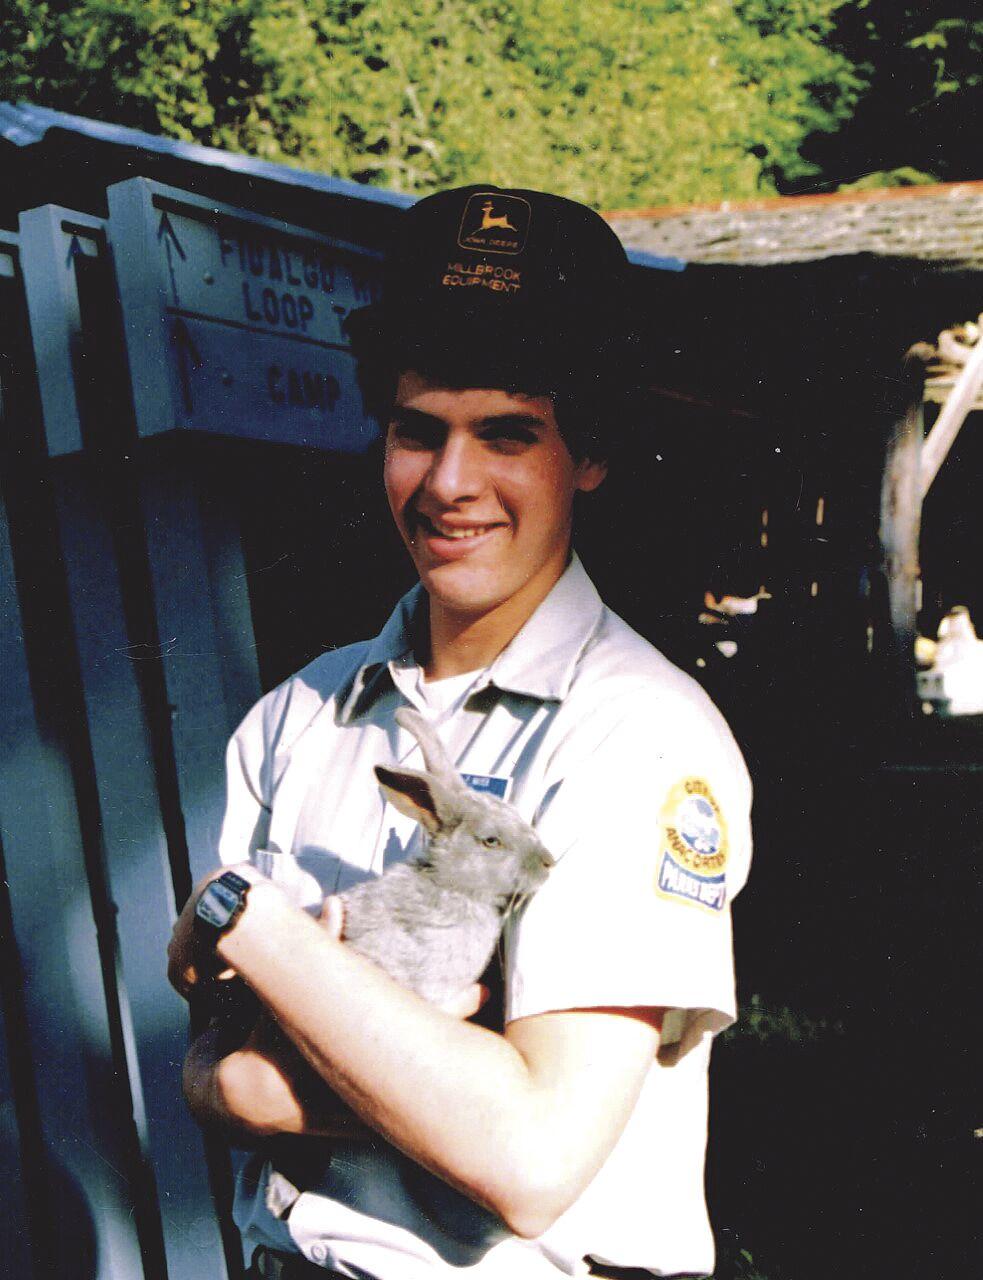 Peter Mayer, Washington Park 1987